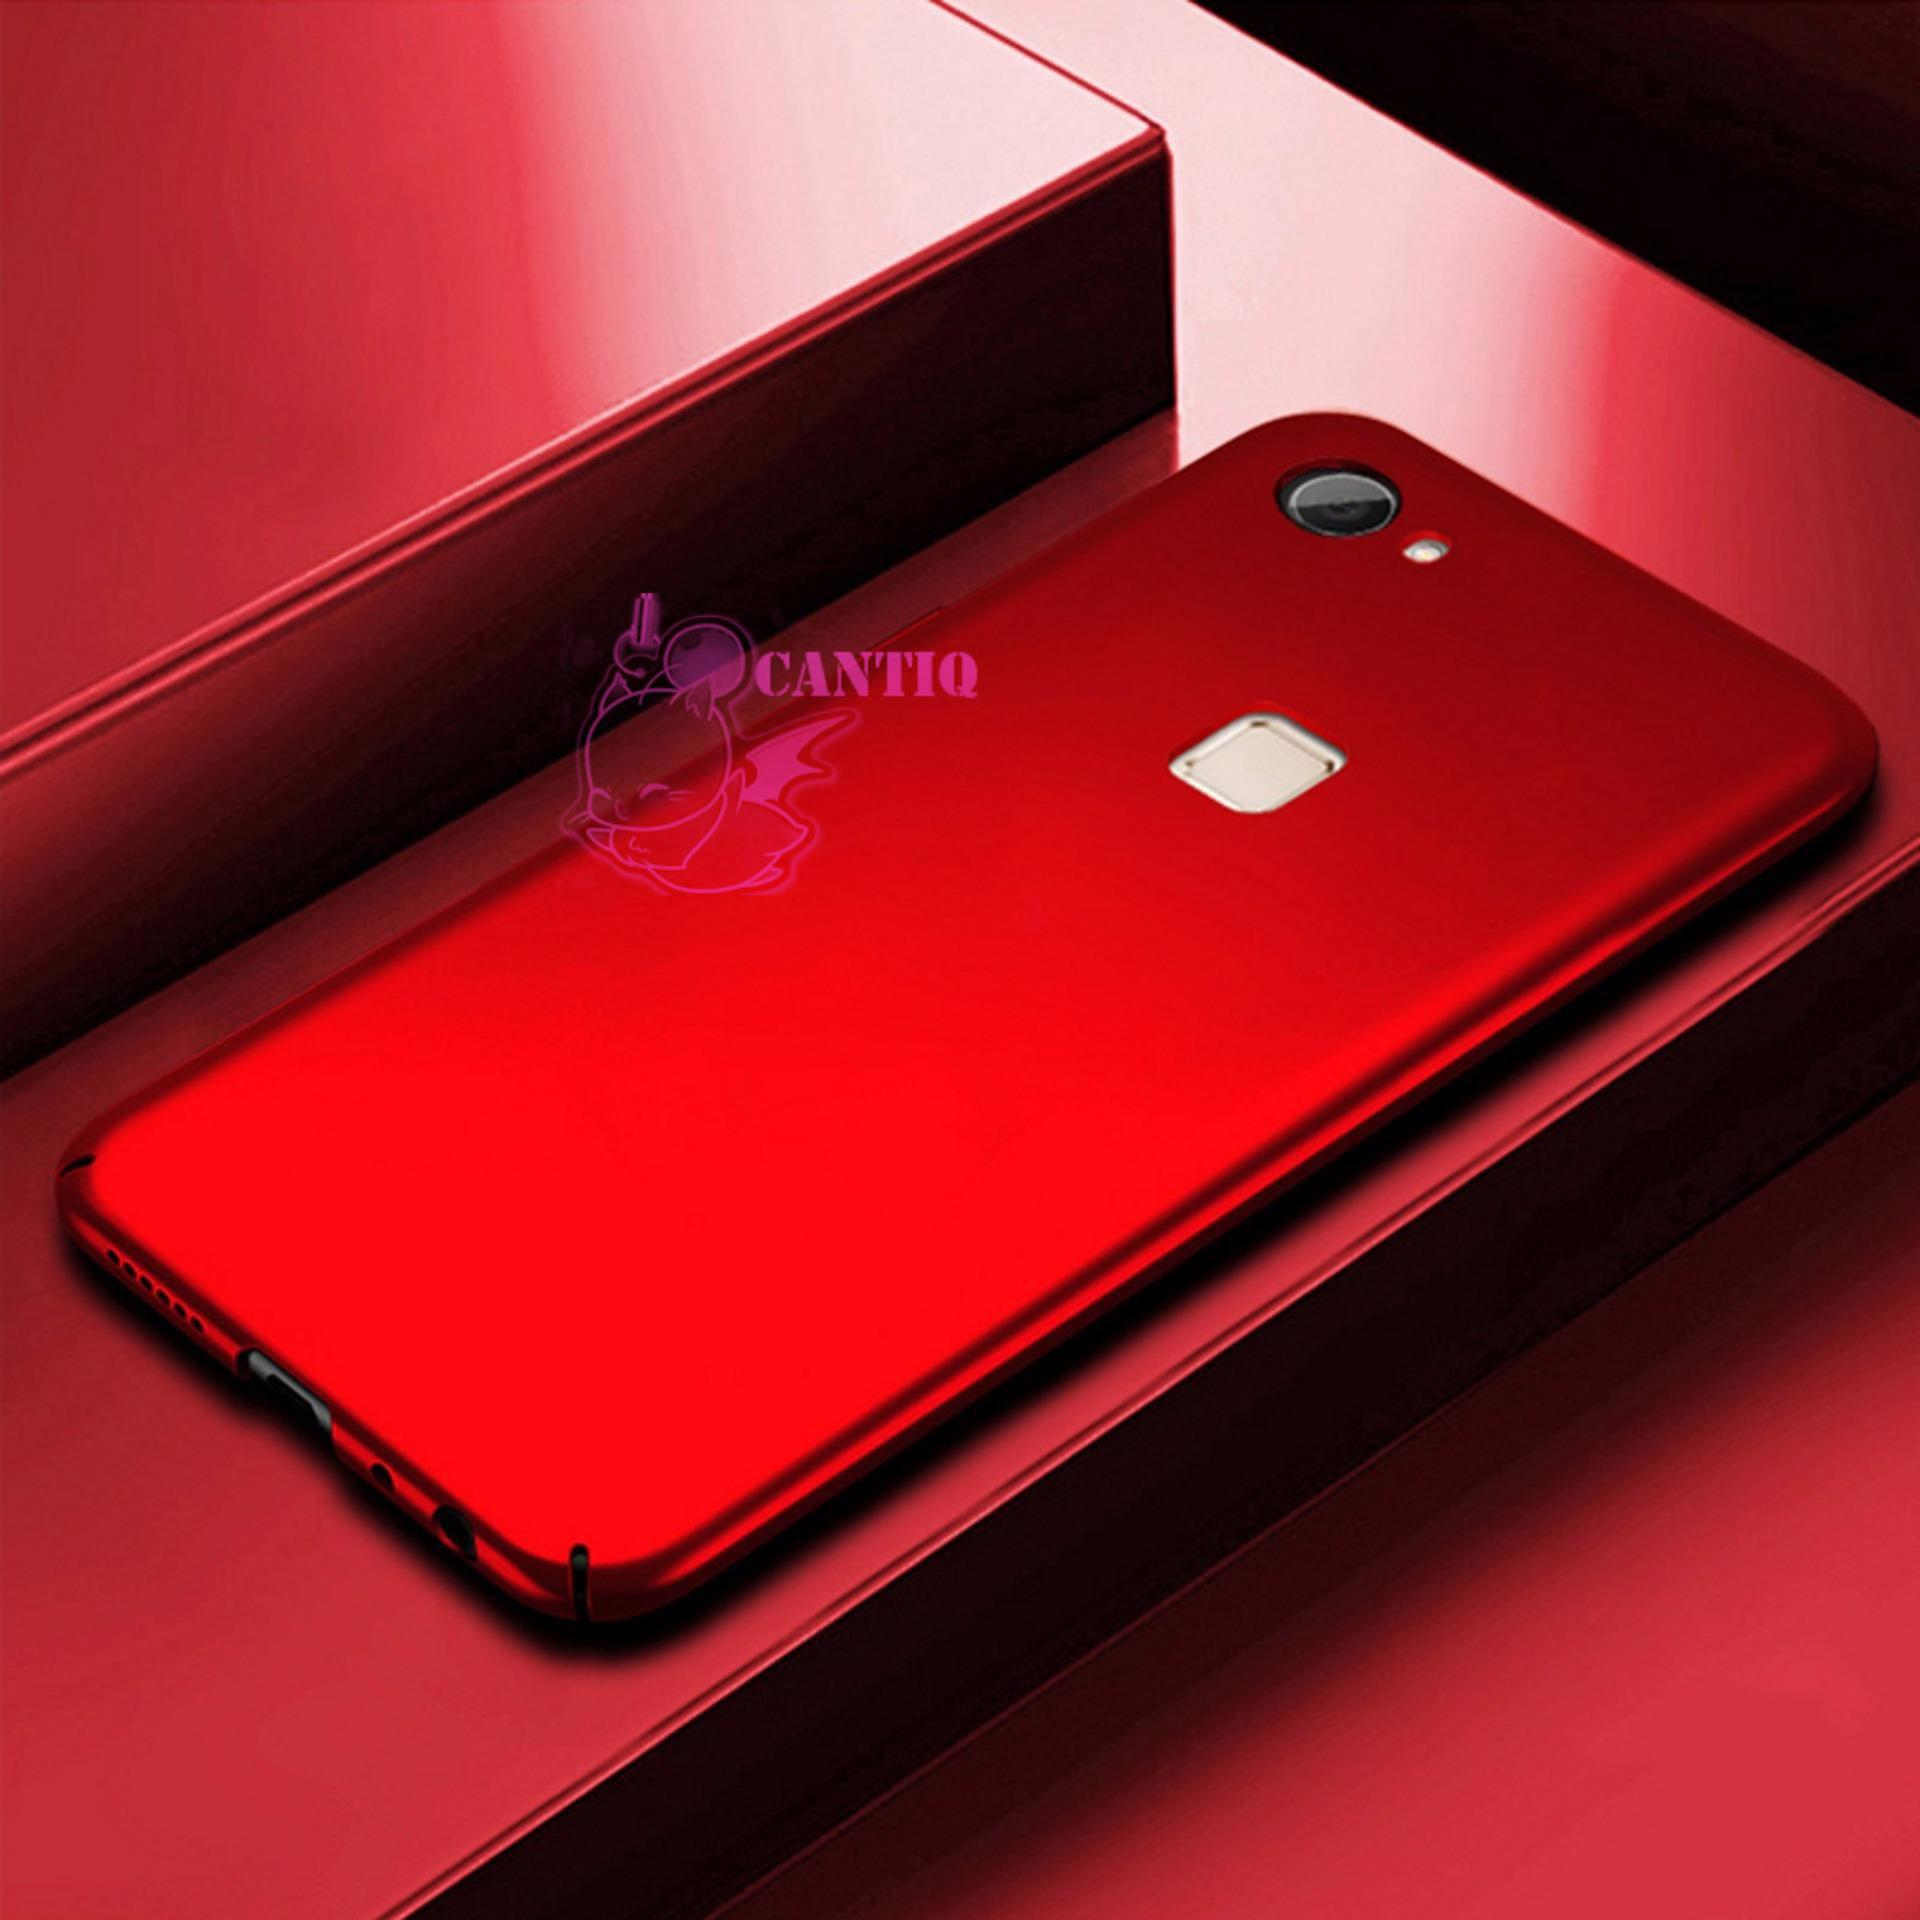 QCF Case Vivo Y75 Hard Slim Red Mate Anti Fingerprint Hybrid Case Baby Skin Vivo Y75 / Baby Hardcase Vivo Y75 / Baby Skin Vivo Y75 / Casing Vivo Y75 / Case Vivo Y75 - Merah / Red